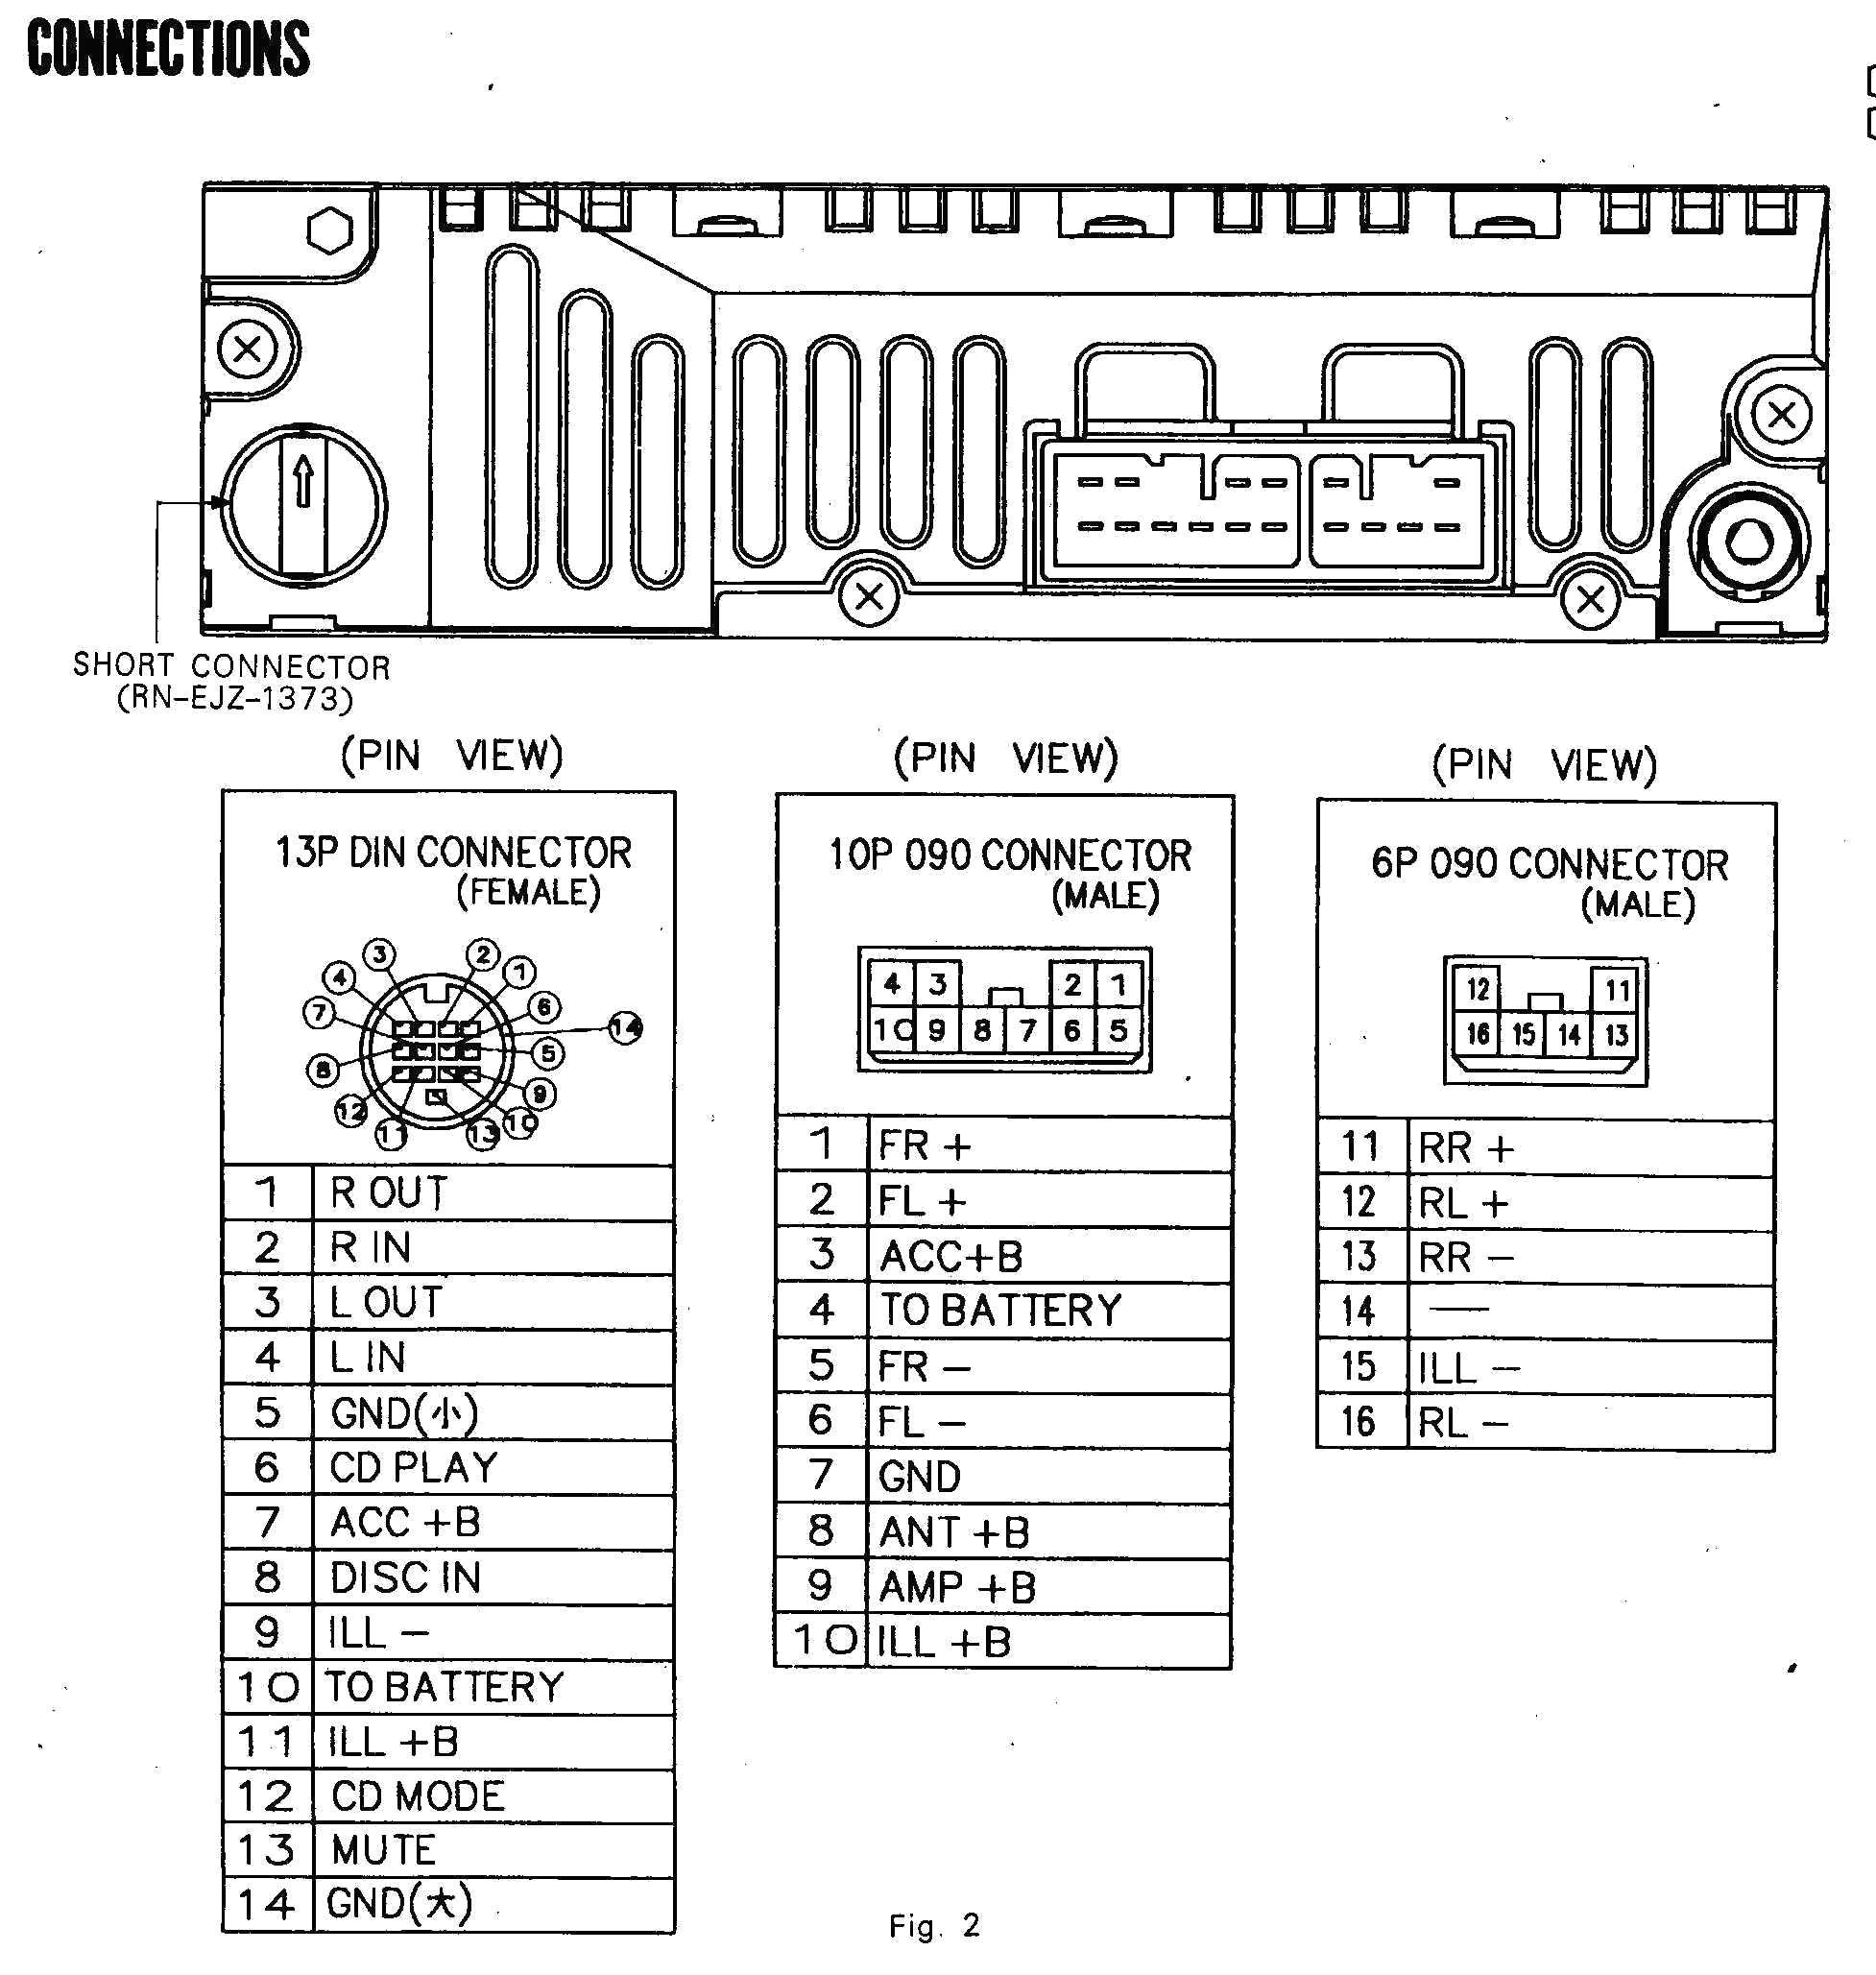 Sony Car Stereo Wiring Diagram Car Stereo Wiring Diagram Knowing Factory Diagrams New sony Radio Of Sony Car Stereo Wiring Diagram